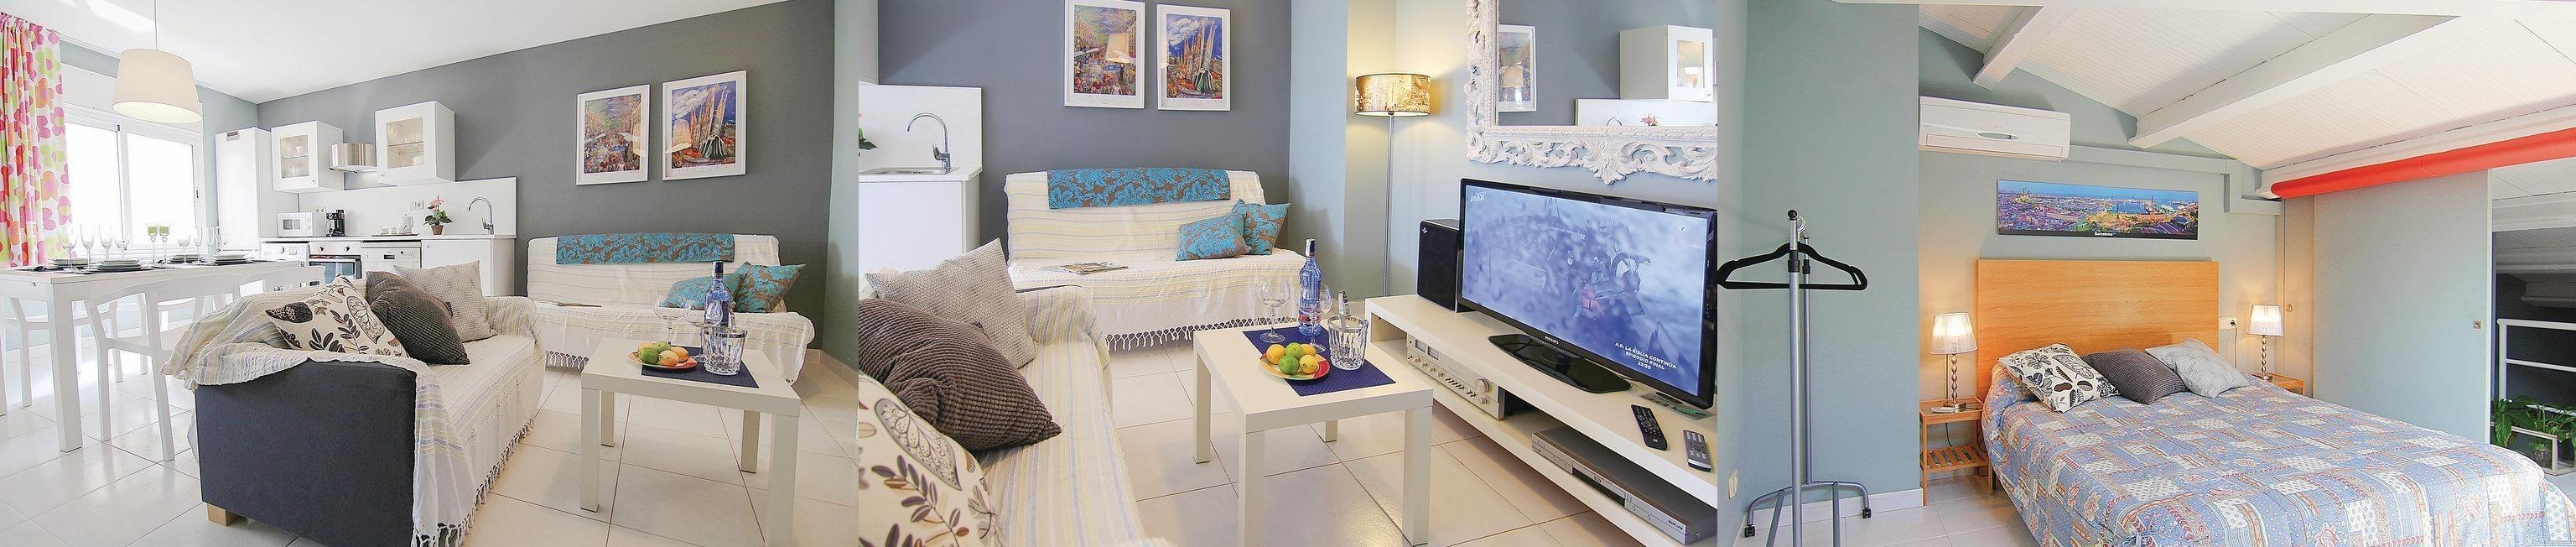 Two-Bedroom Apartment Calella